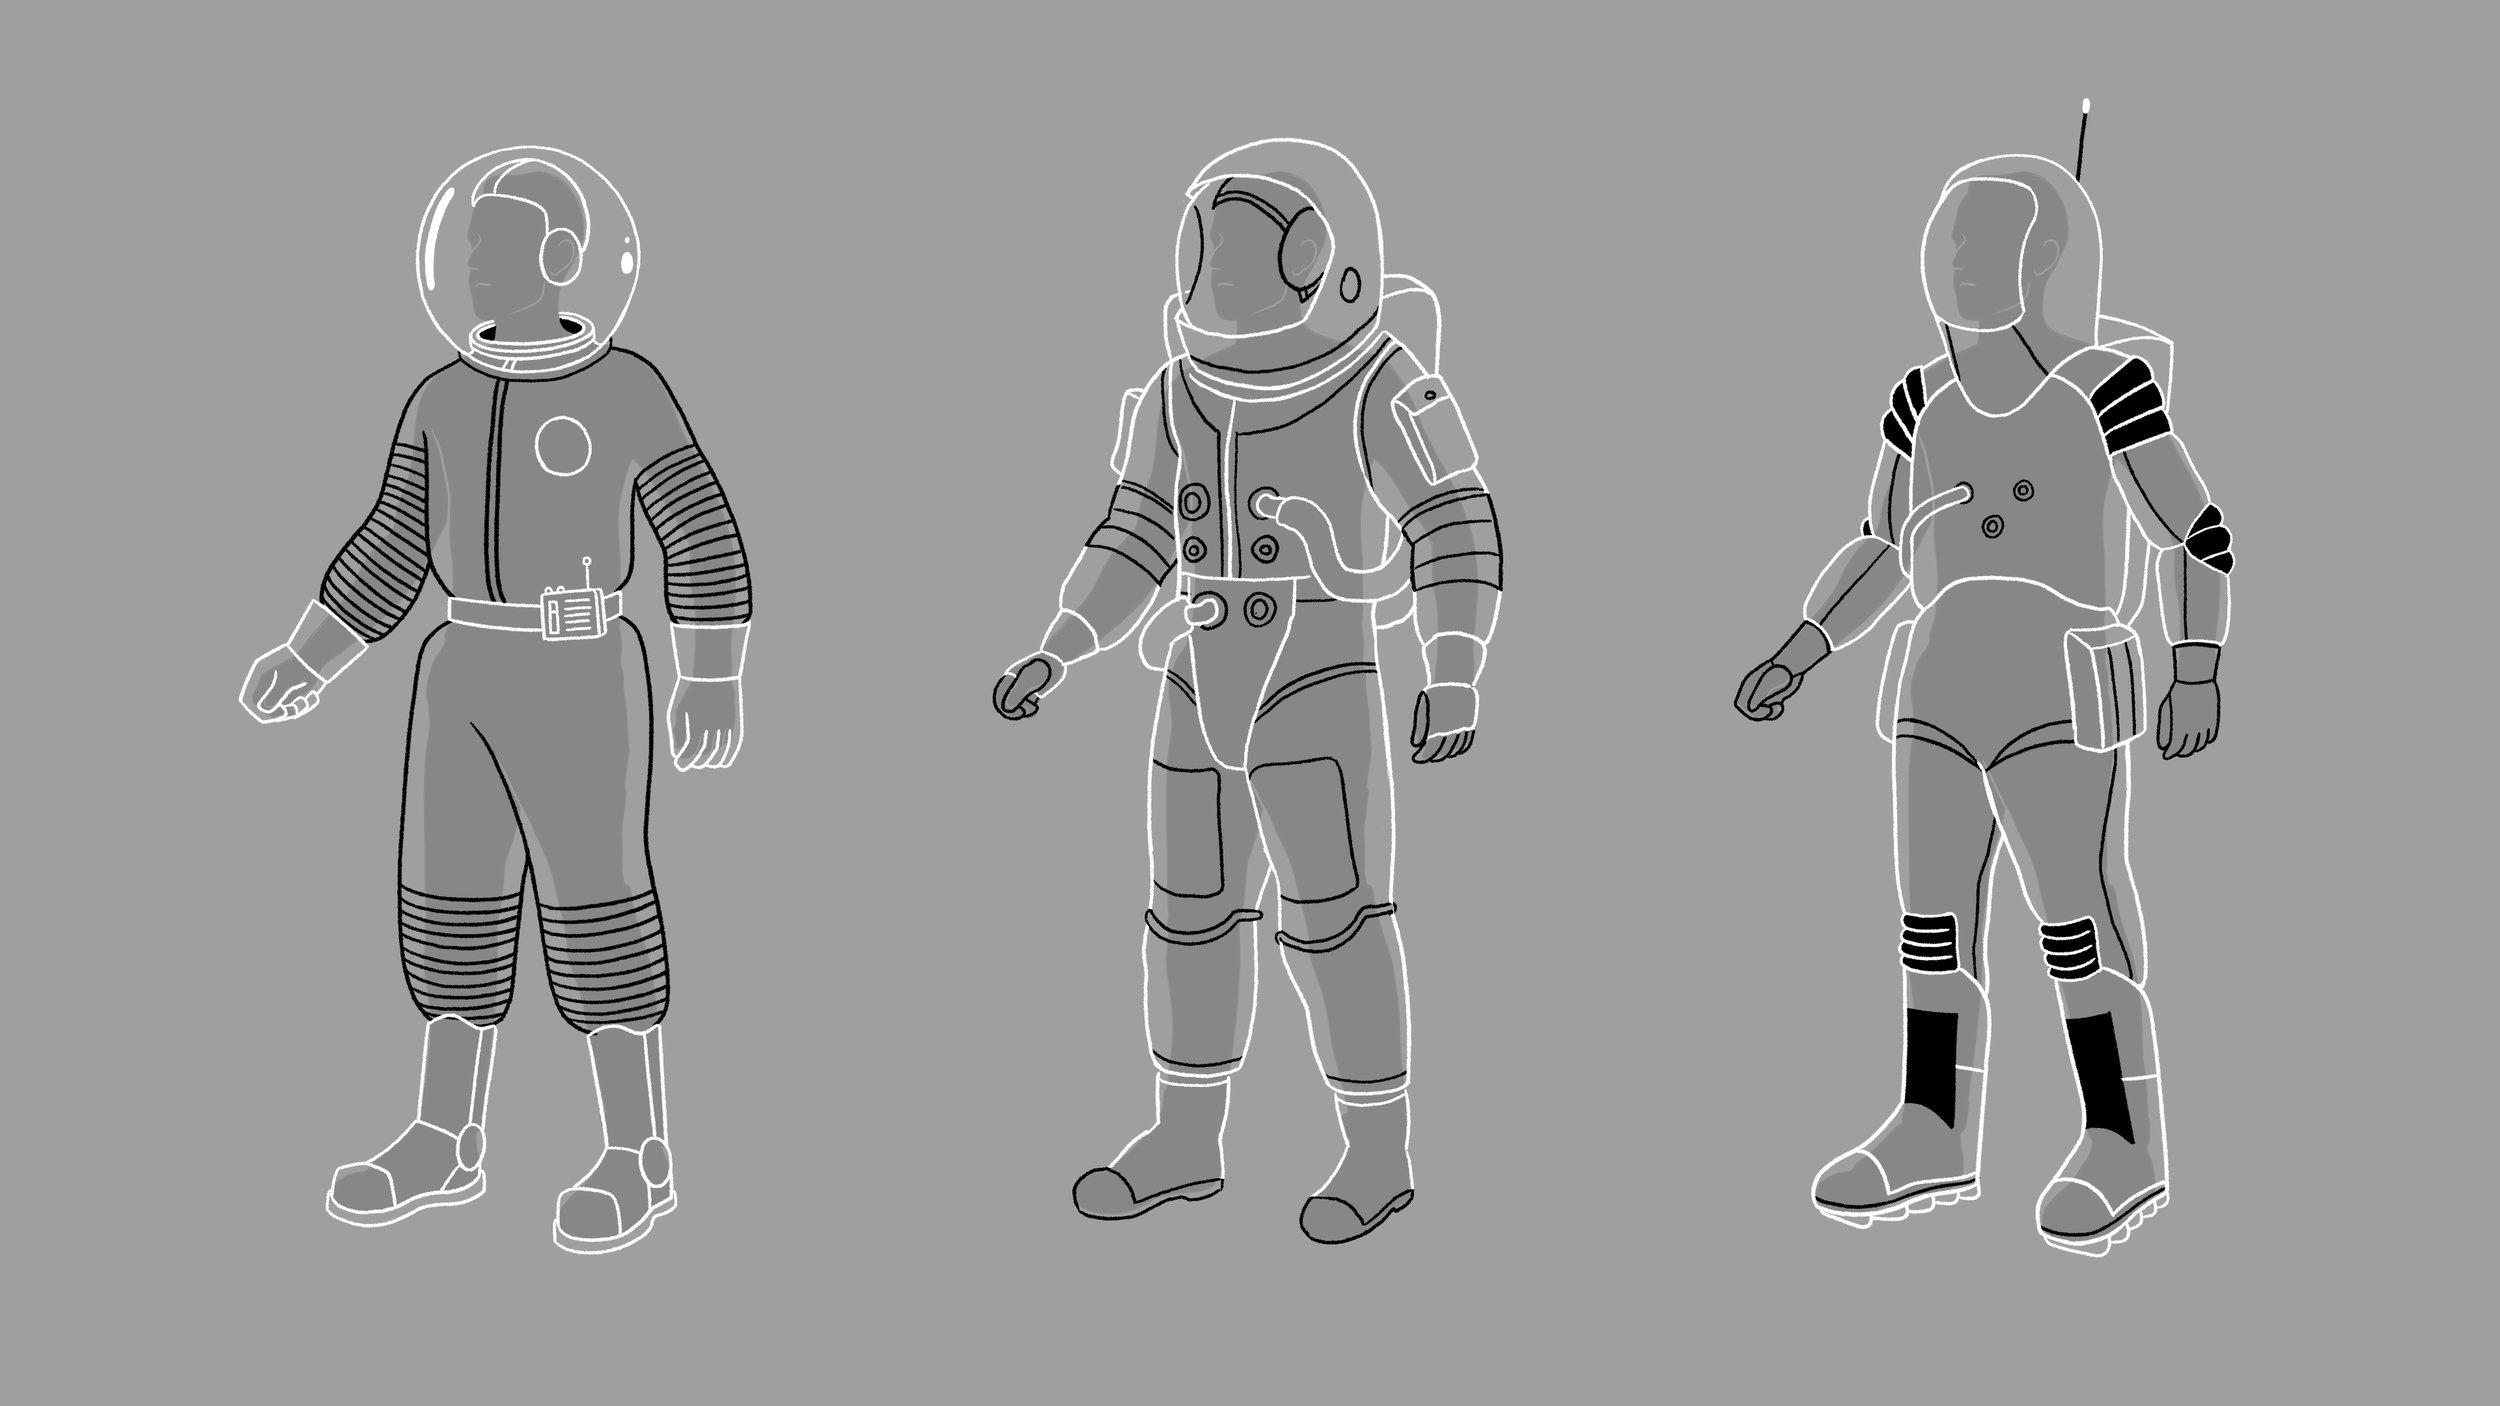 Oreo_Kid_Inside_Astronauts_010.jpg